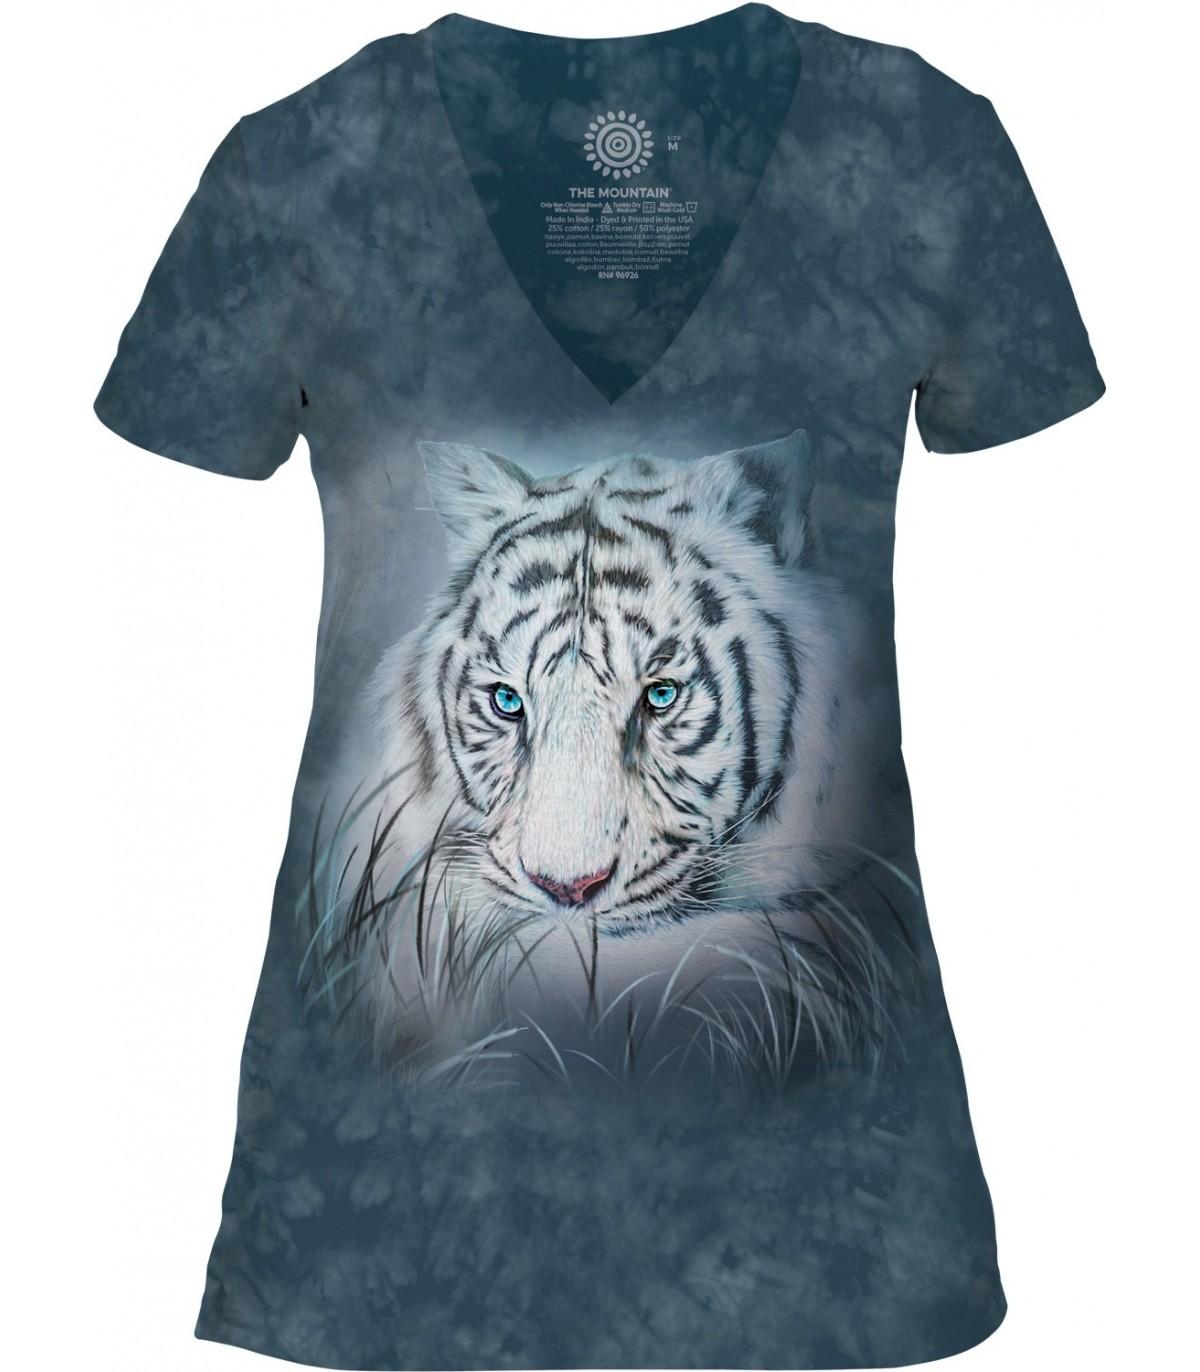 2fd05e81644 Tee-shirt femme motif Tigre avec col en V - T-shirt tigre blanc